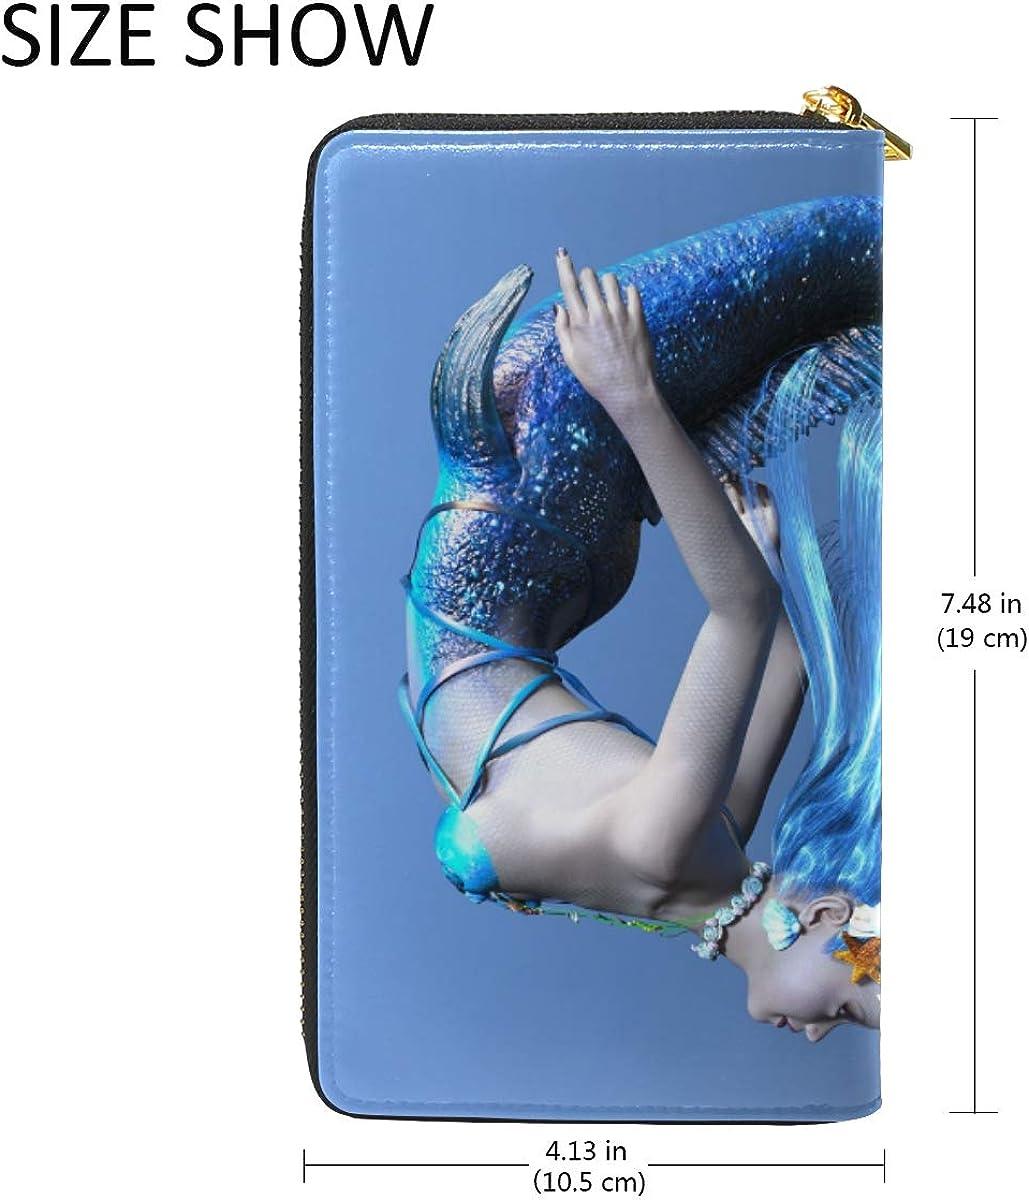 FANTAZIO Clutch Purses for Women 3D CG Rendering Of A Mermaid Pattern Business Card Case